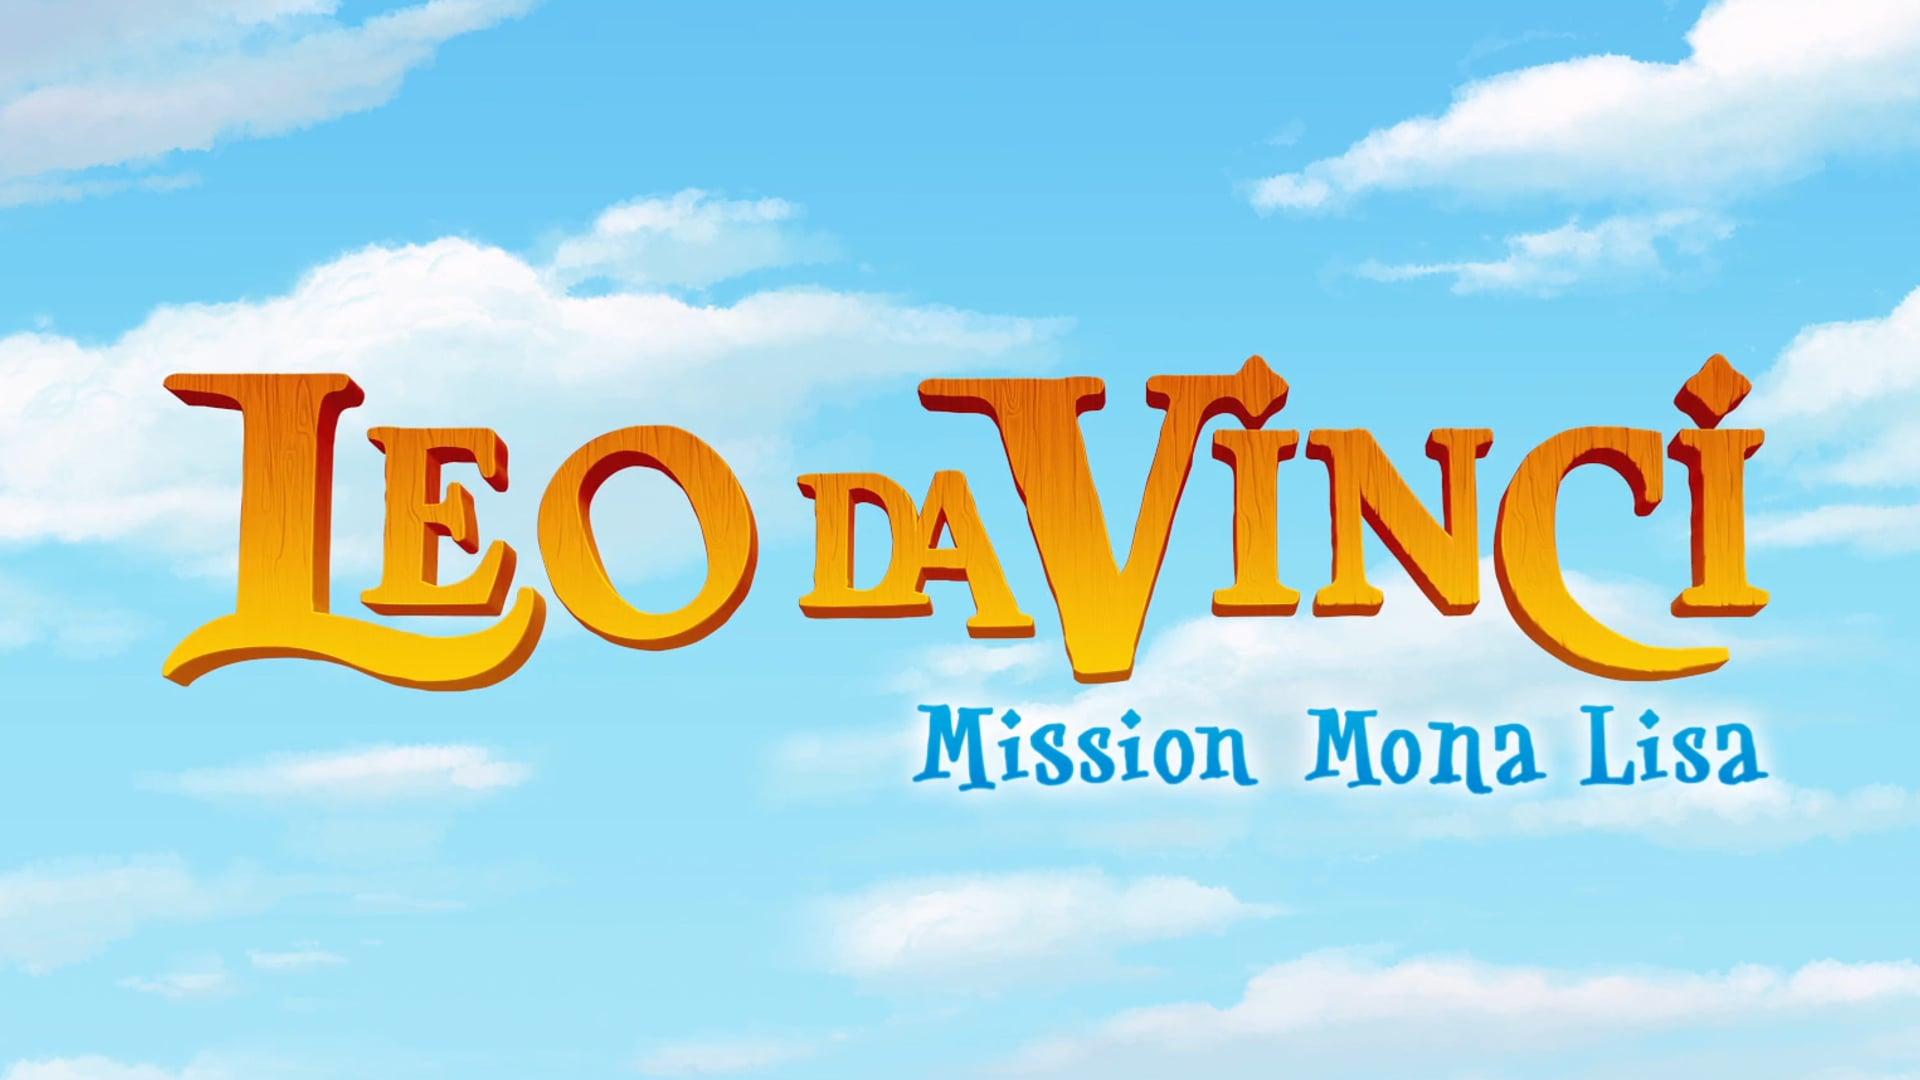 """Leo da Vinci - Mission Mona Lisa"" - Trailer (2018-01-24)"